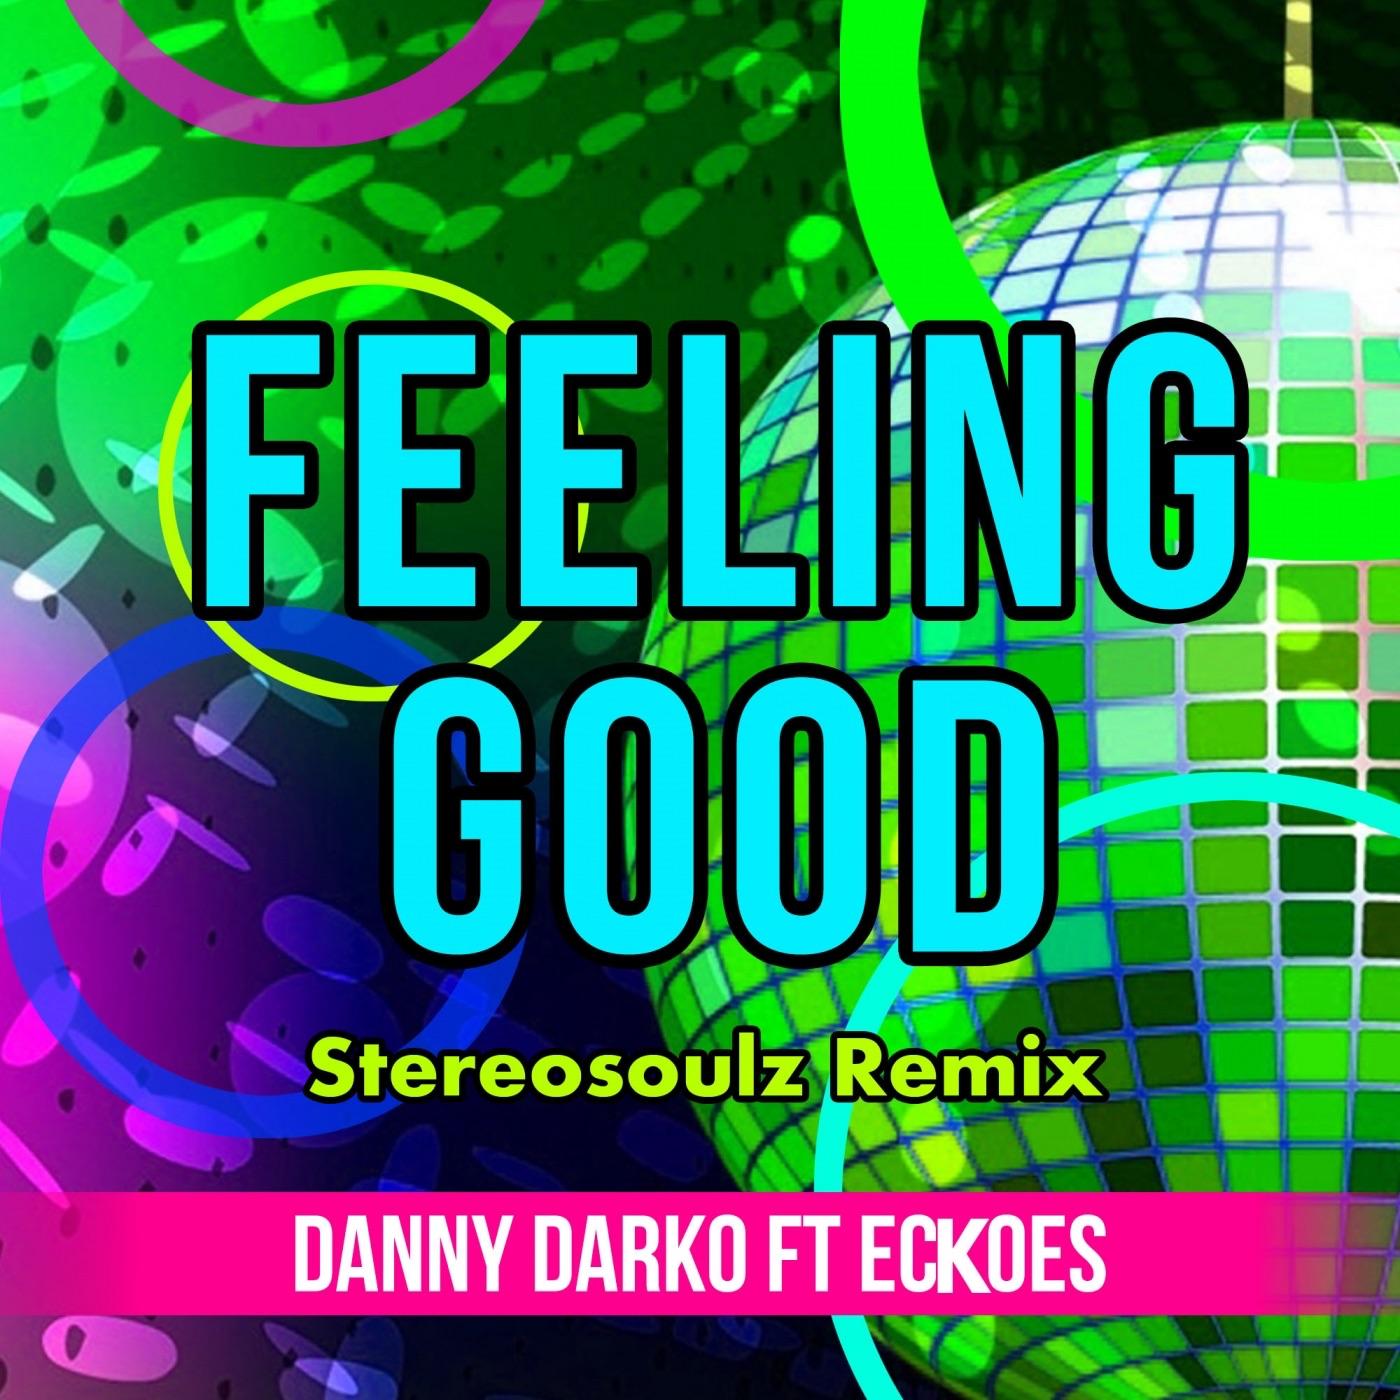 Feeling Good (Stereosoulz Remix) [feat. Eckoes] - Single